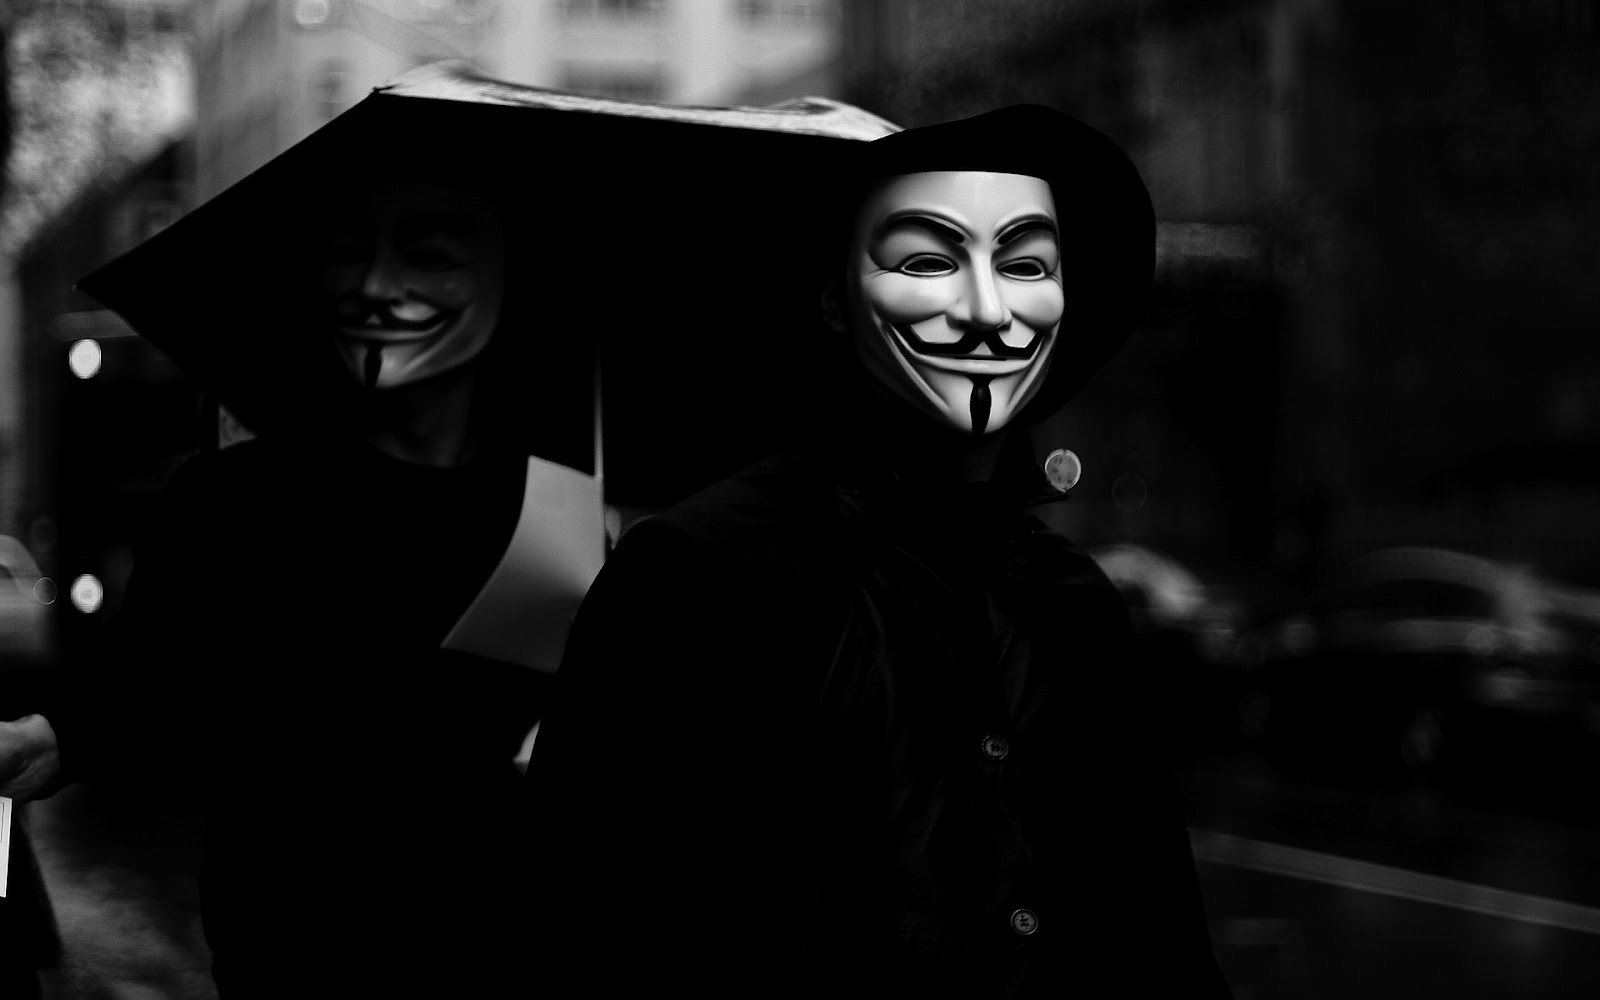 http://1.bp.blogspot.com/-_VACRKCJBzk/T2pZQxYt_SI/AAAAAAAAAdw/Le7vz8P8RFw/s1600/anonymous+wallpaper+guy+fawkes.jpg